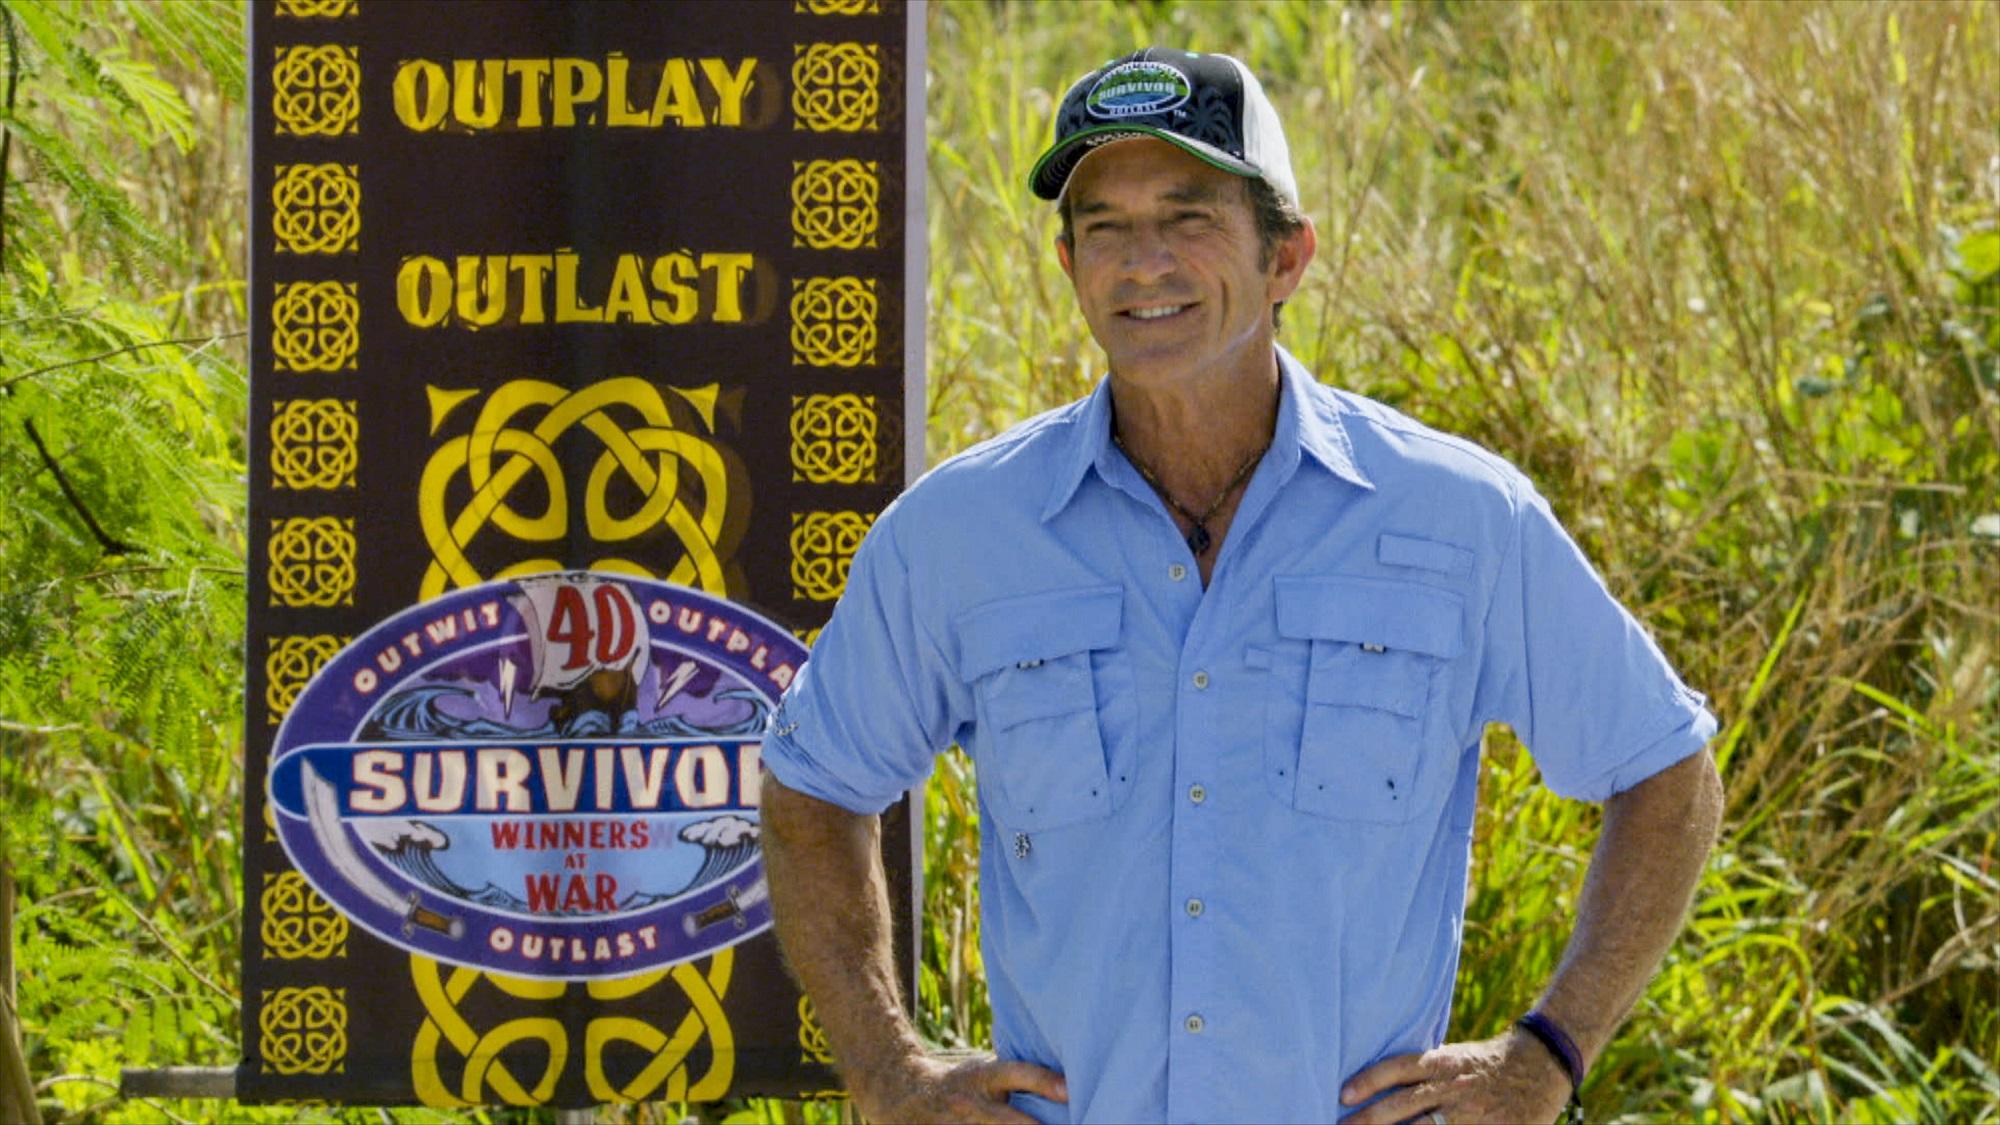 Jeff Probst, legendary host of Survivor, says Survivor 41 will be dangerous